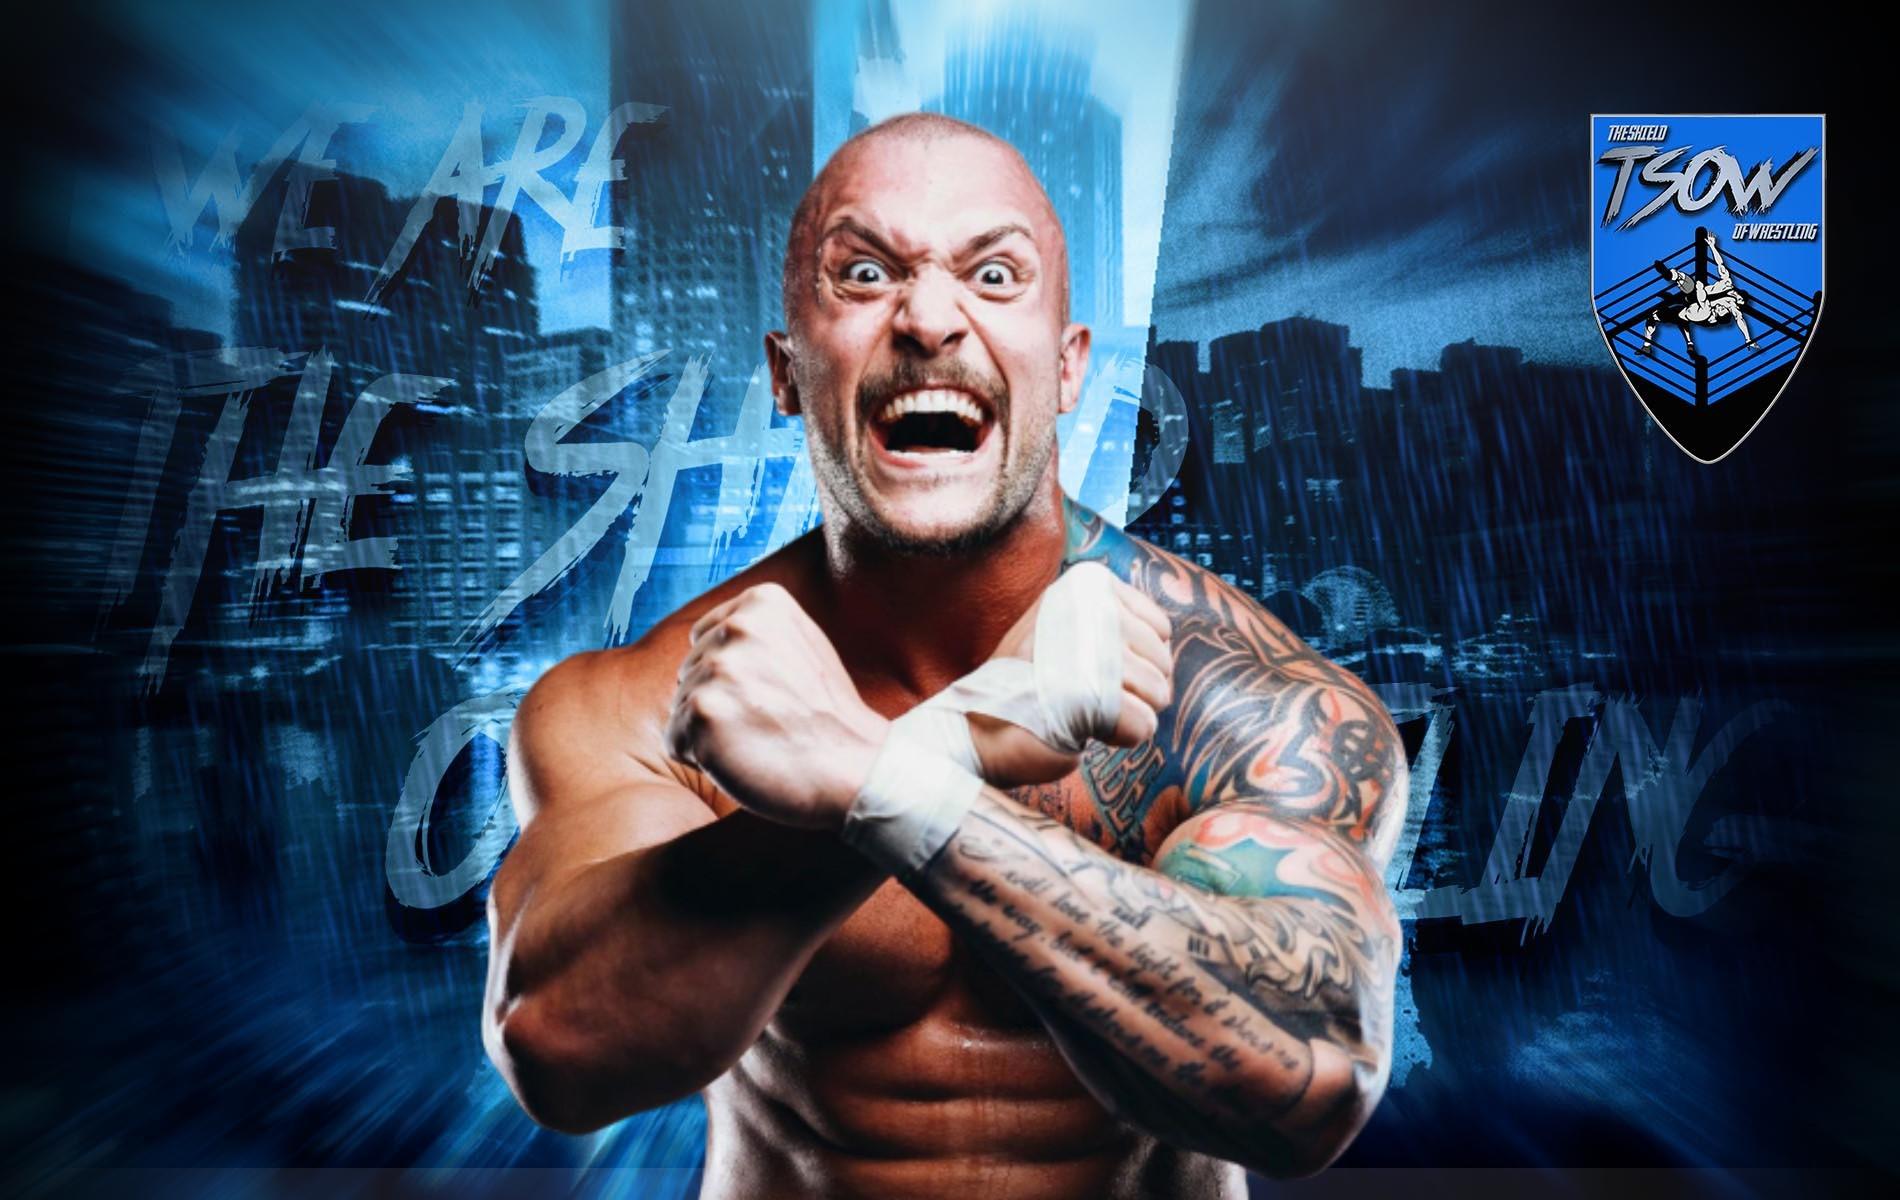 Karrion Kross trova spassose le frecciatine di Randy Orton rivolte a NXT